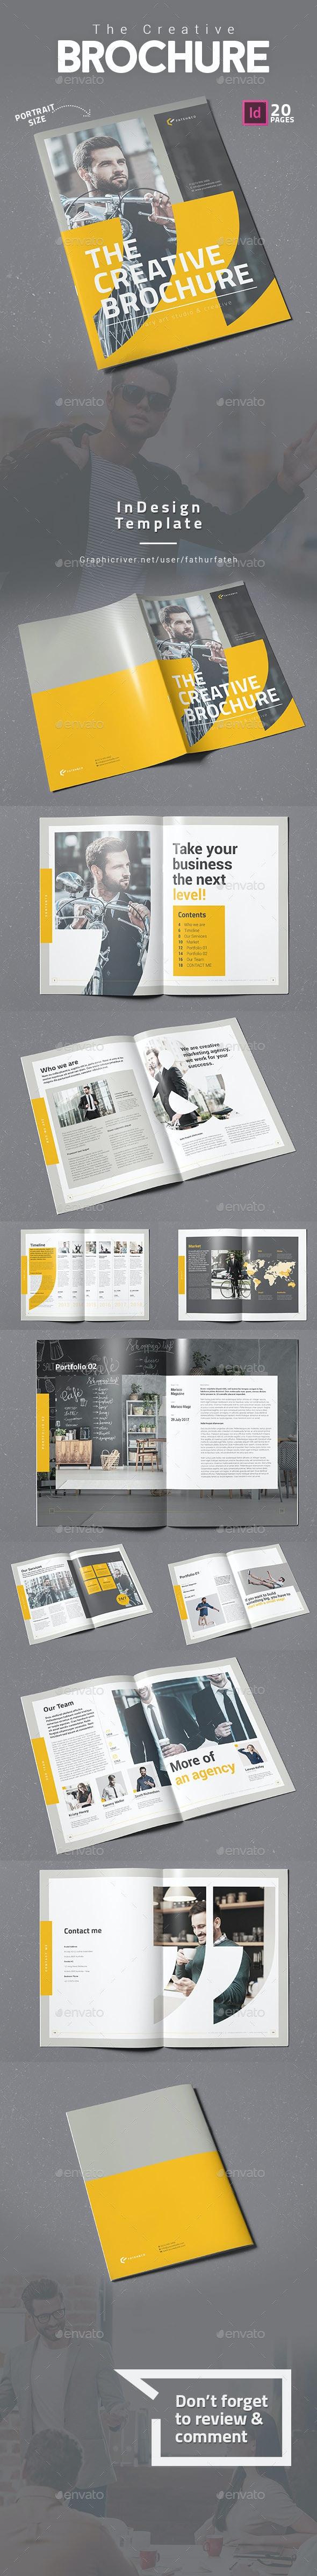 The Creative Brochure Vol.5 - Corporate Brochures